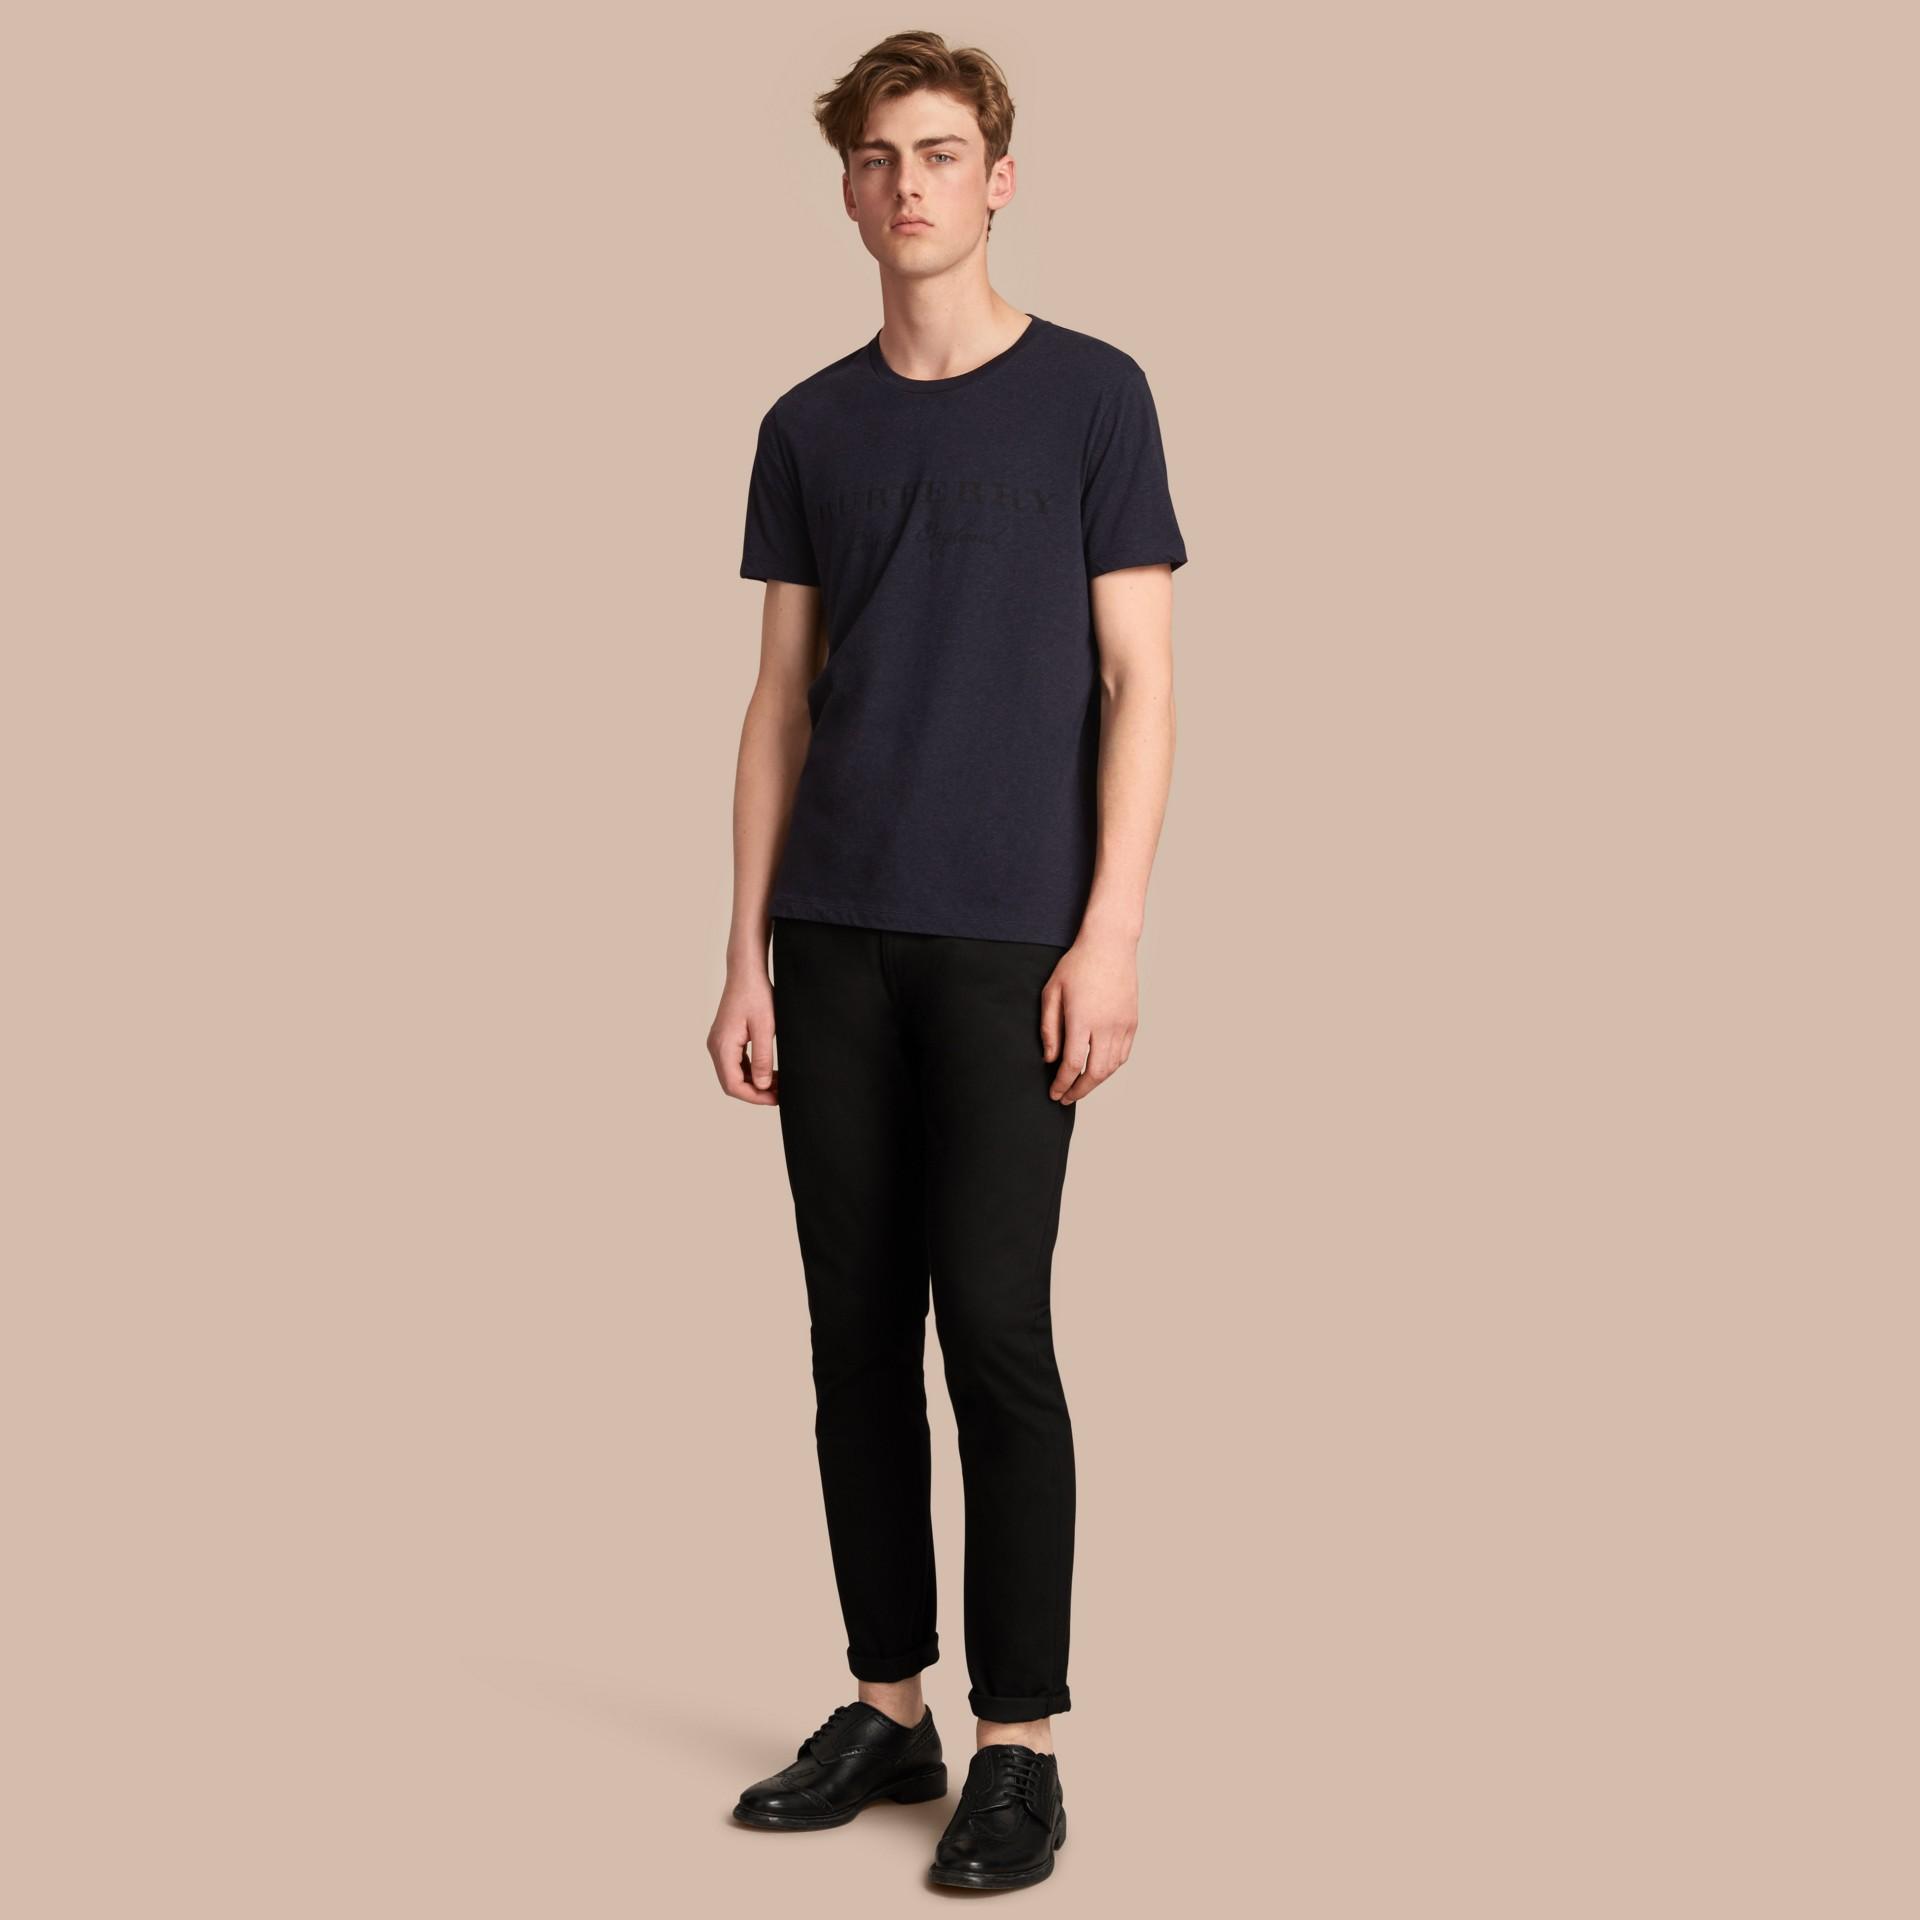 Contrast Motif Cotton Blend T-shirt Navy Melange - gallery image 1